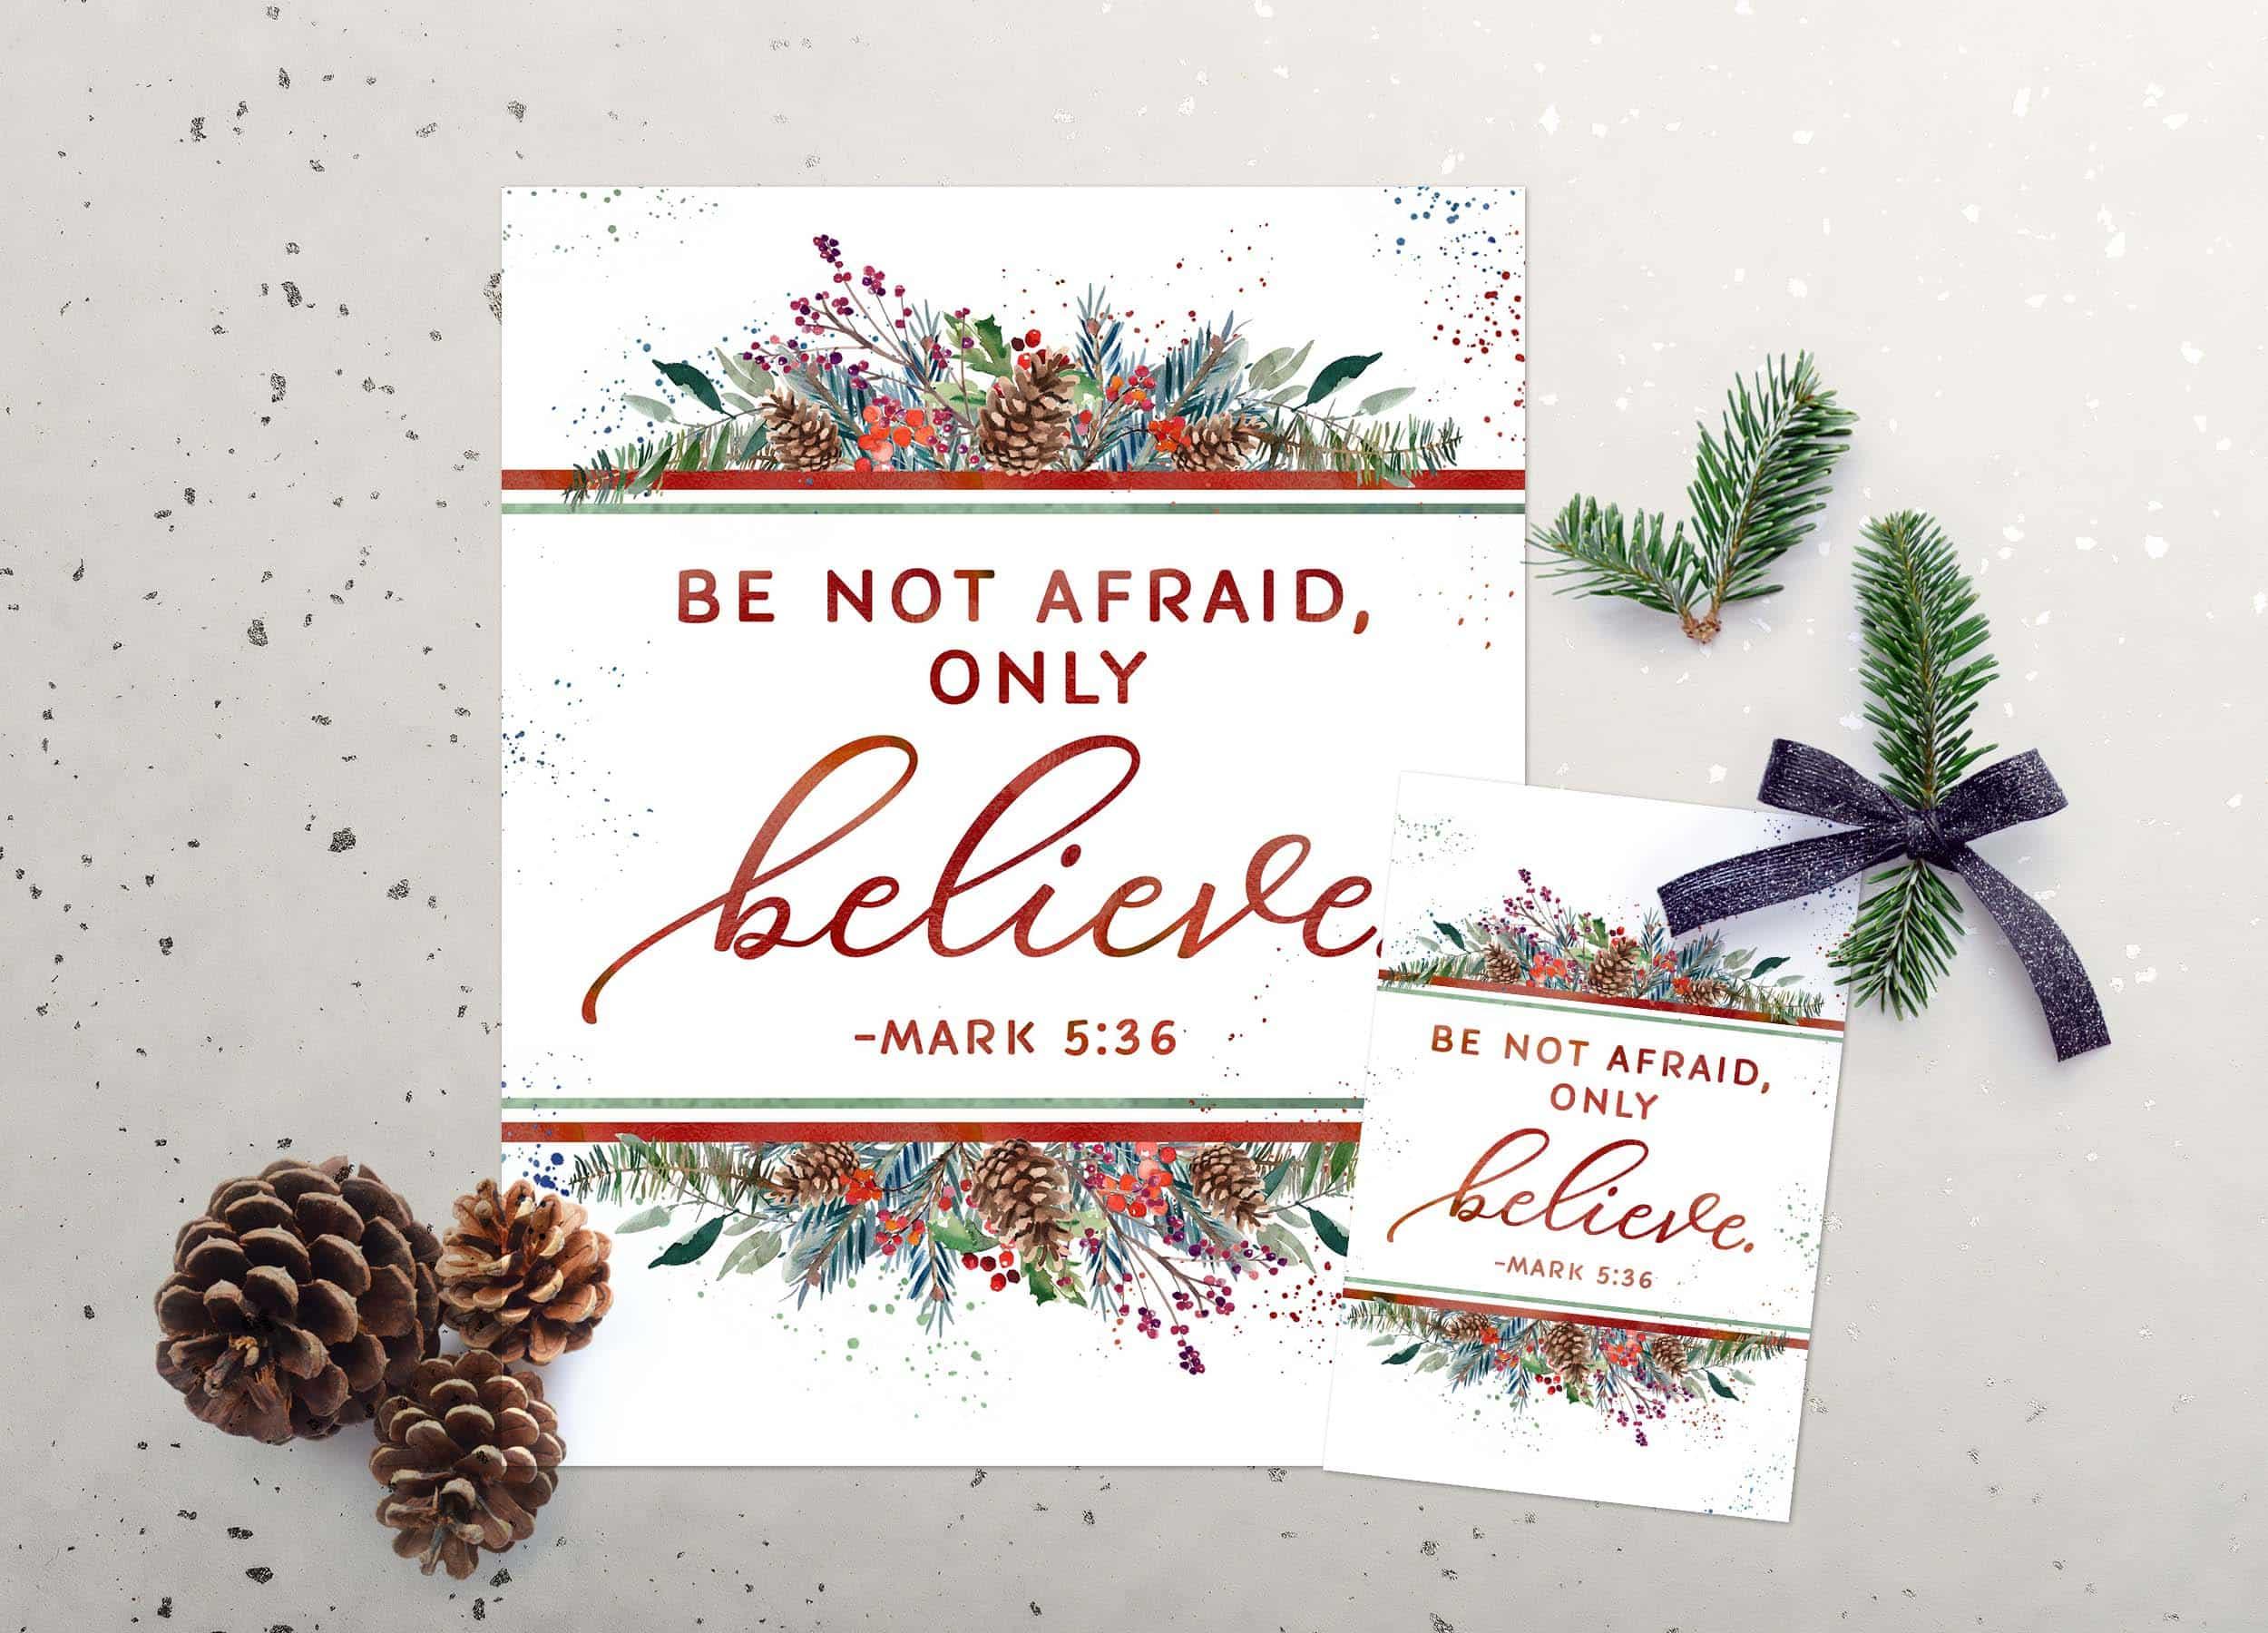 Free Light The Word One by One 2019 Scripture Printable www.TeepeeGirl.com